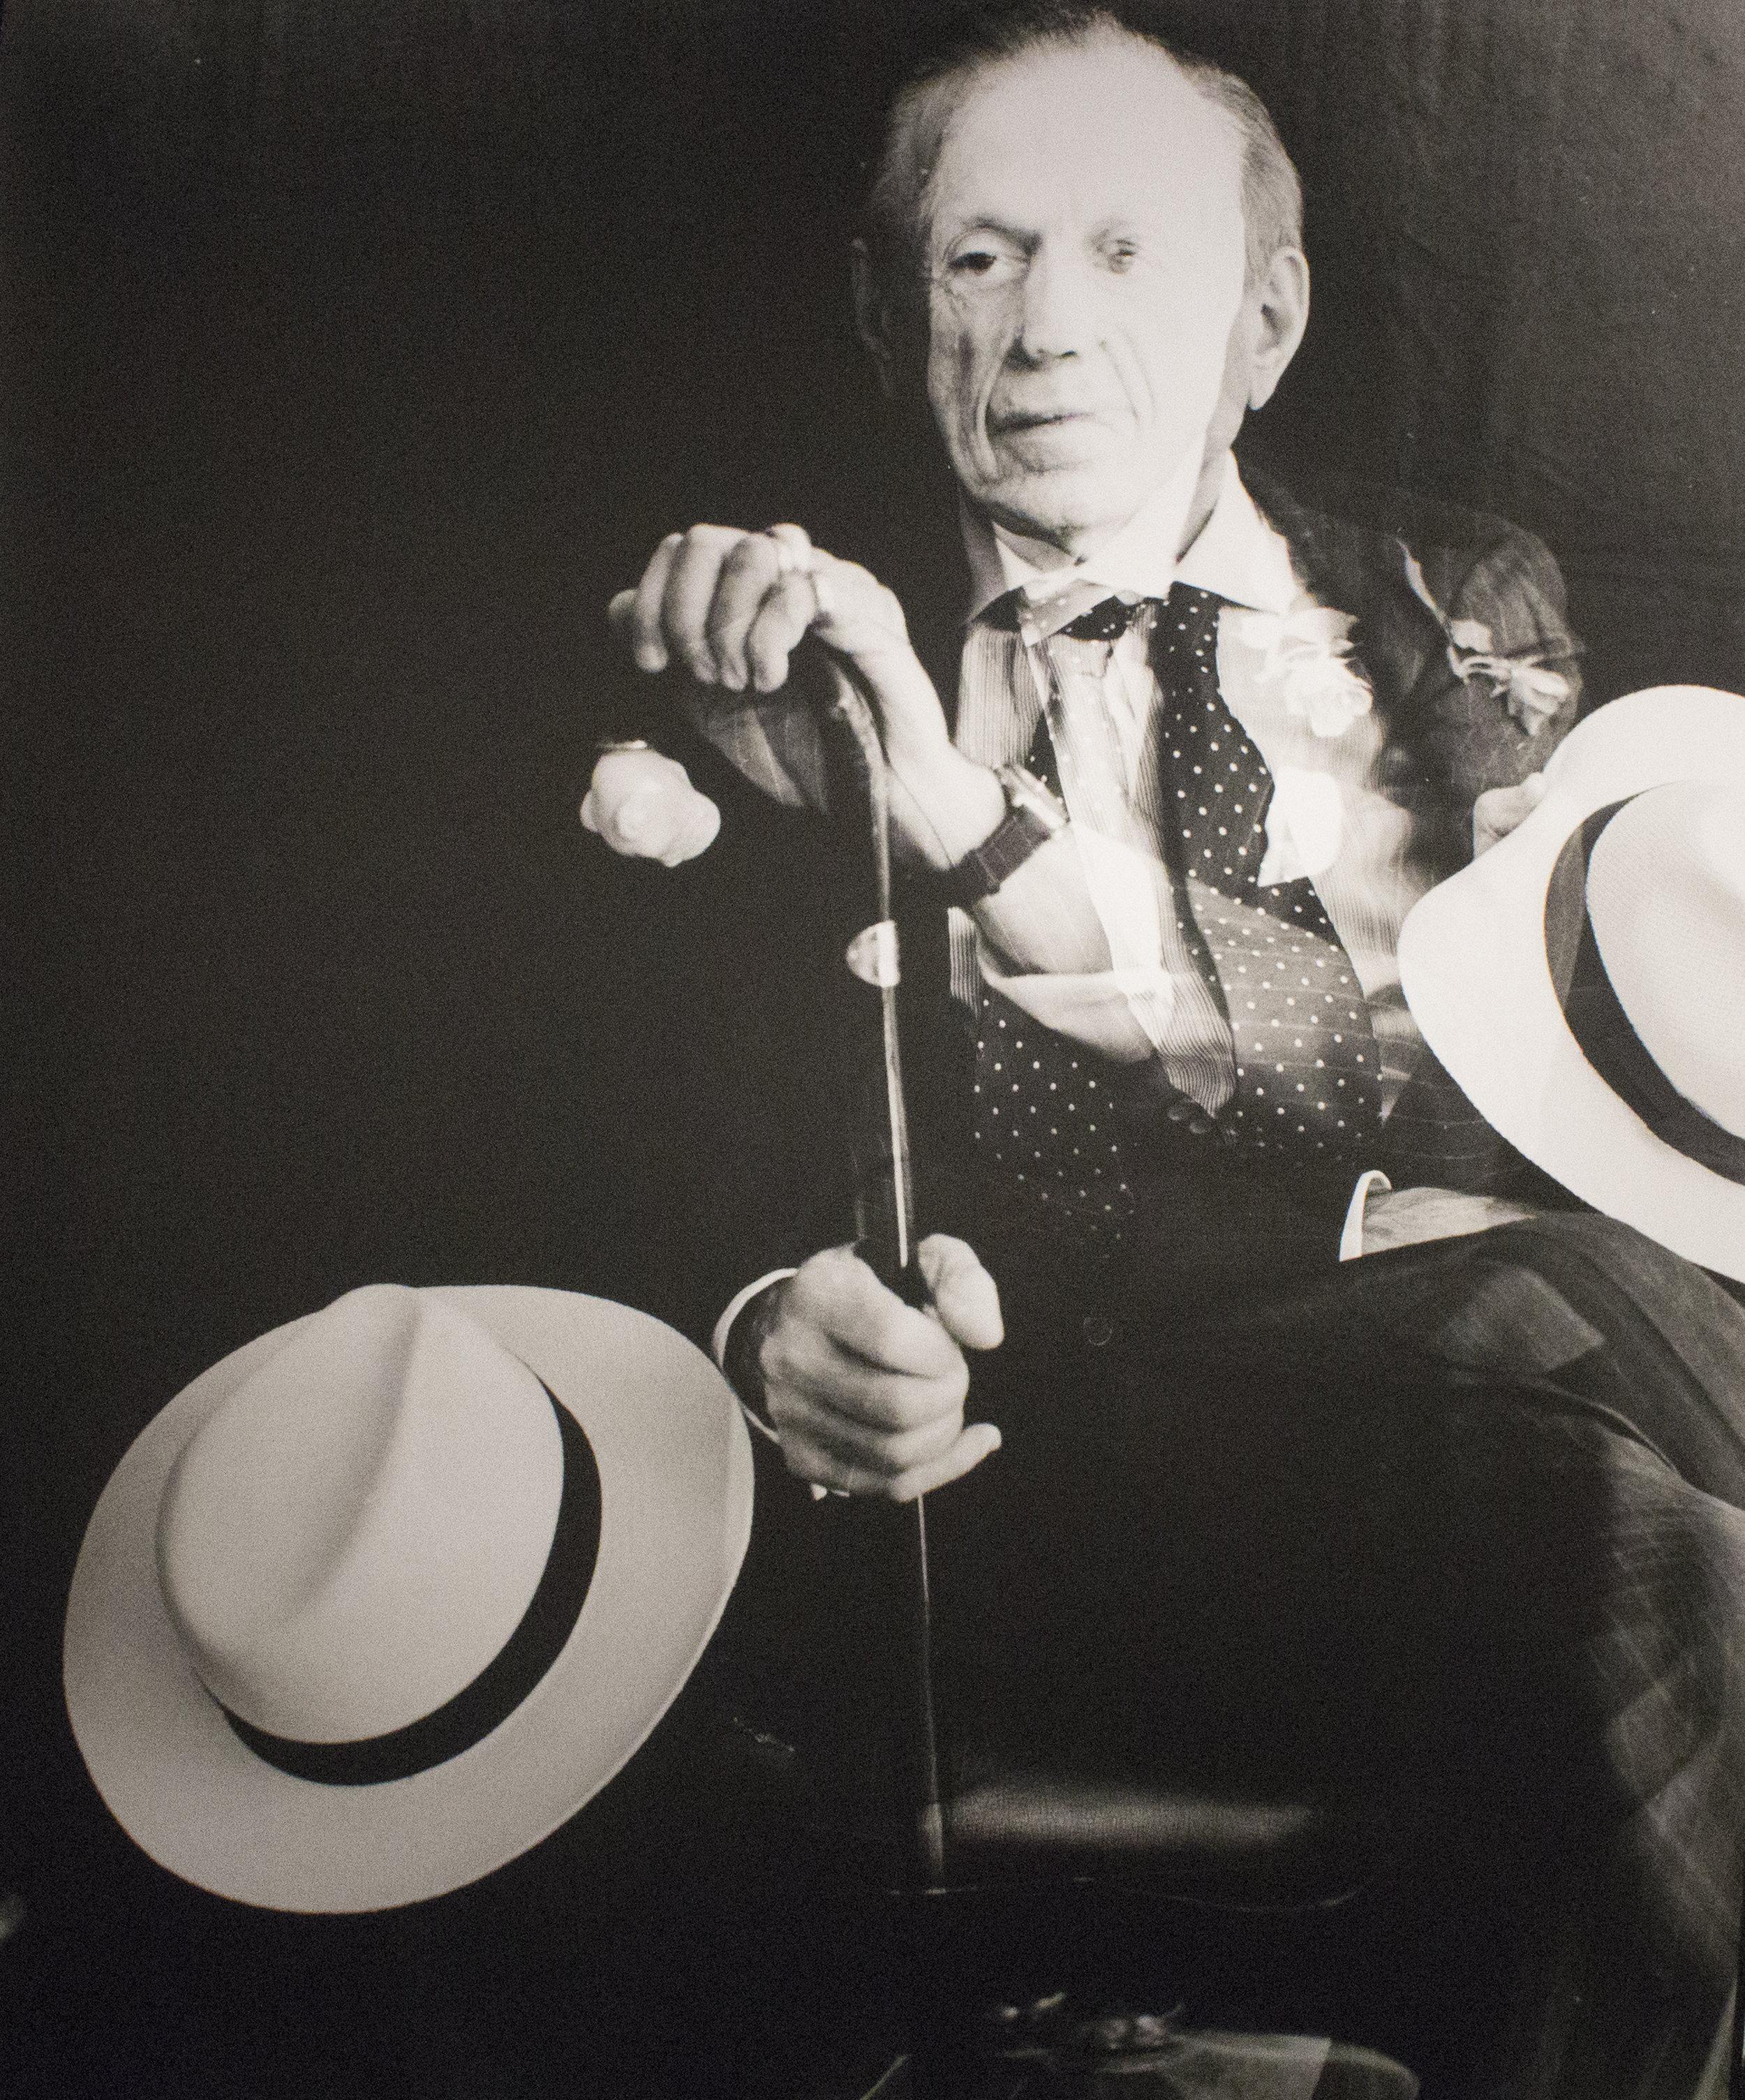 "Portrait of Richard Harlan Blond (The World's Most Interesting Man) , 2012  Gelatin Silver Photograph  23 3/4 x 19"" $1600"